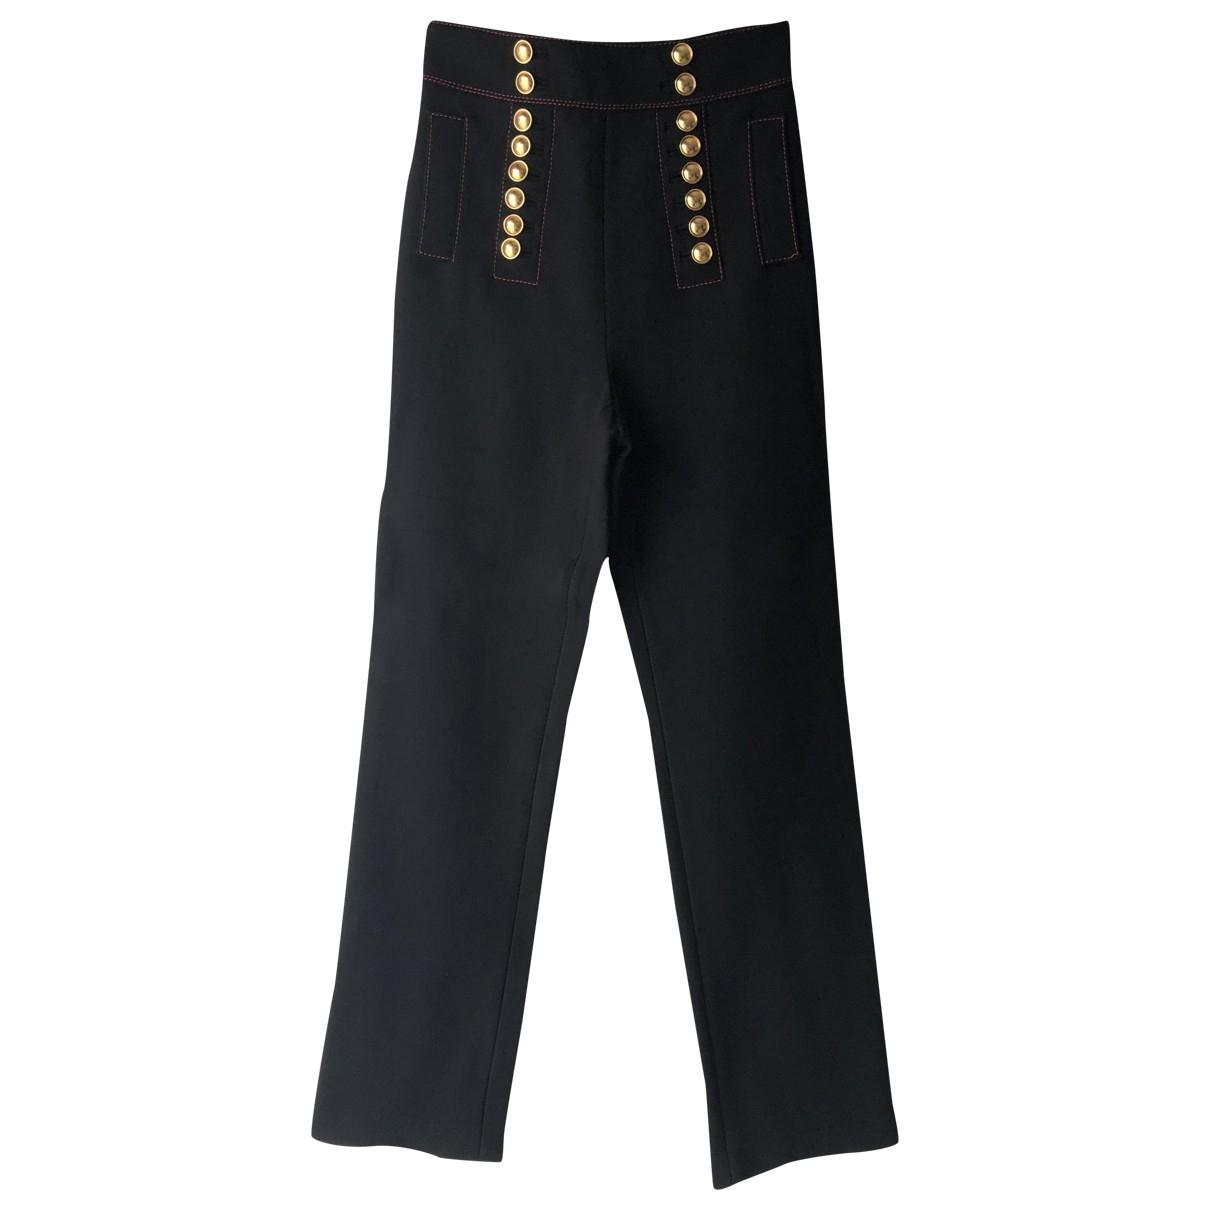 Burberry \N Black Trousers for Women 42 IT